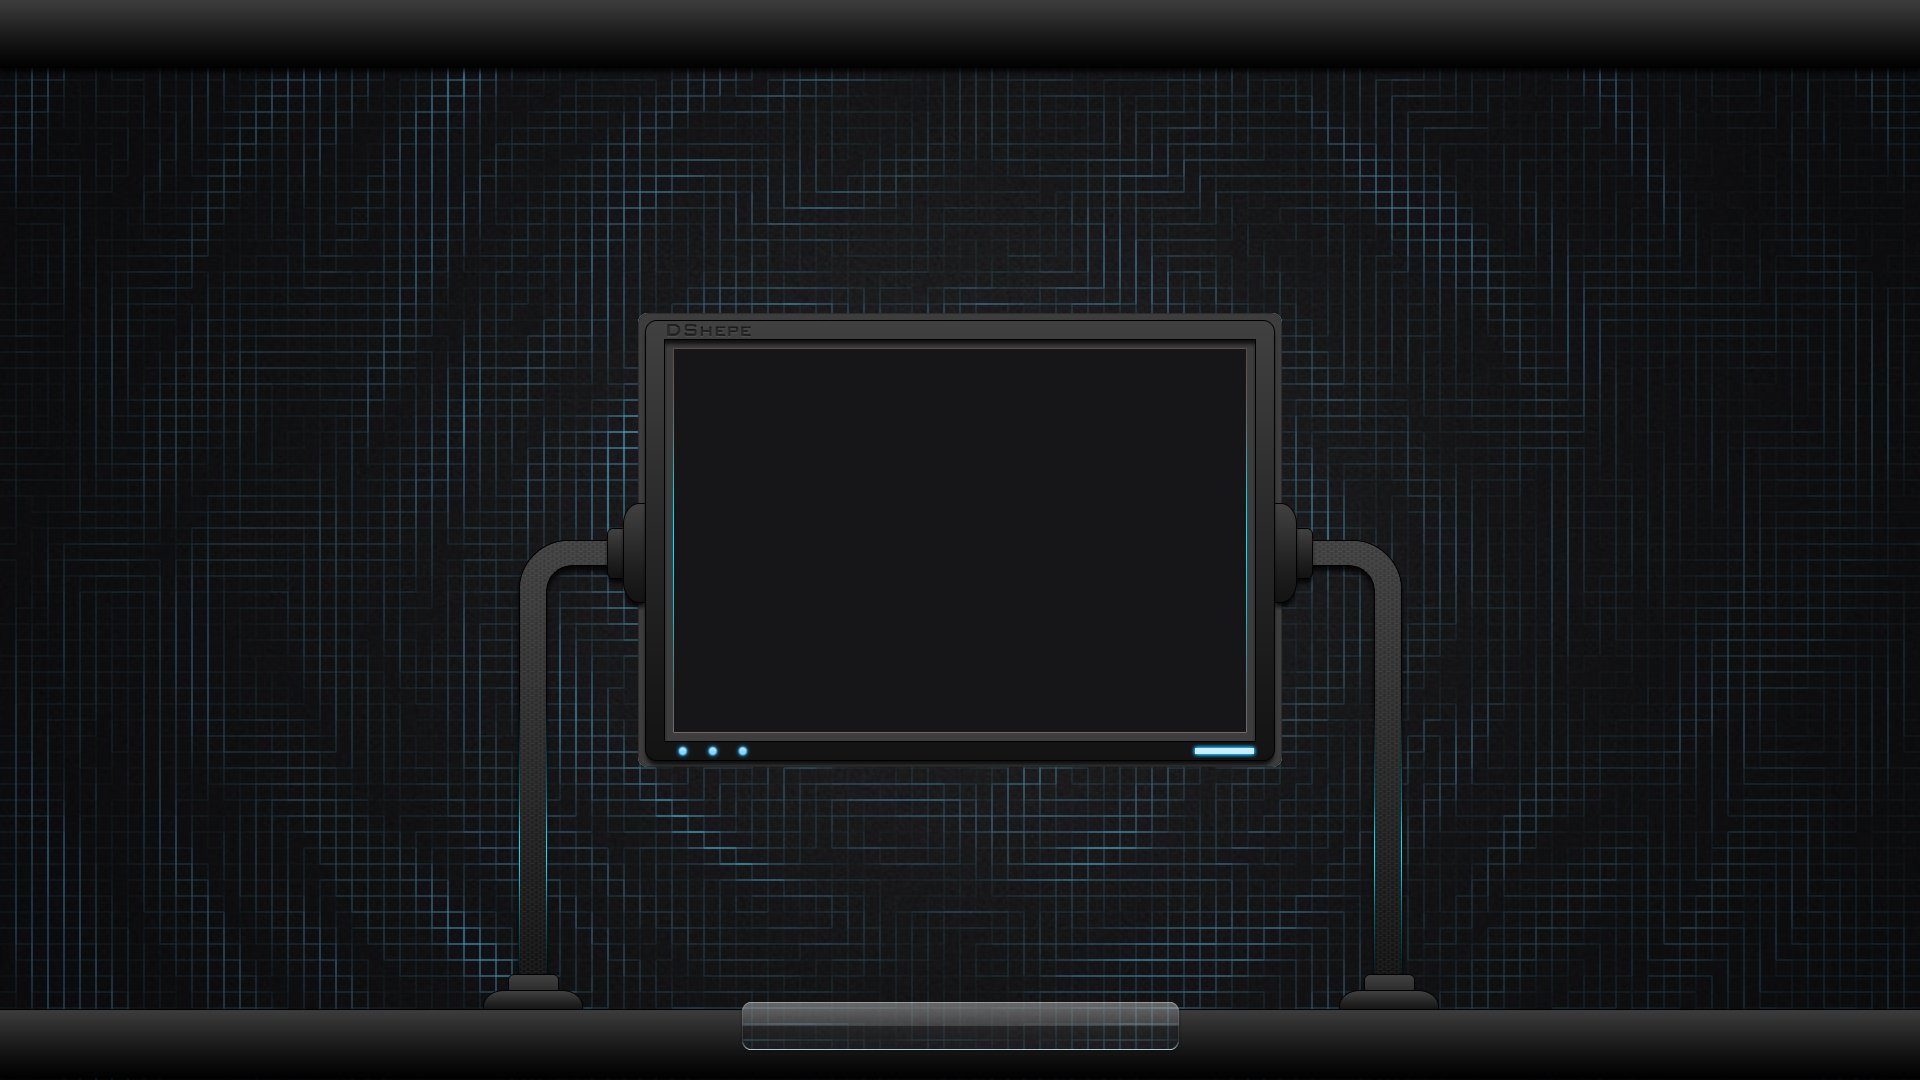 Картинки для экрана логина